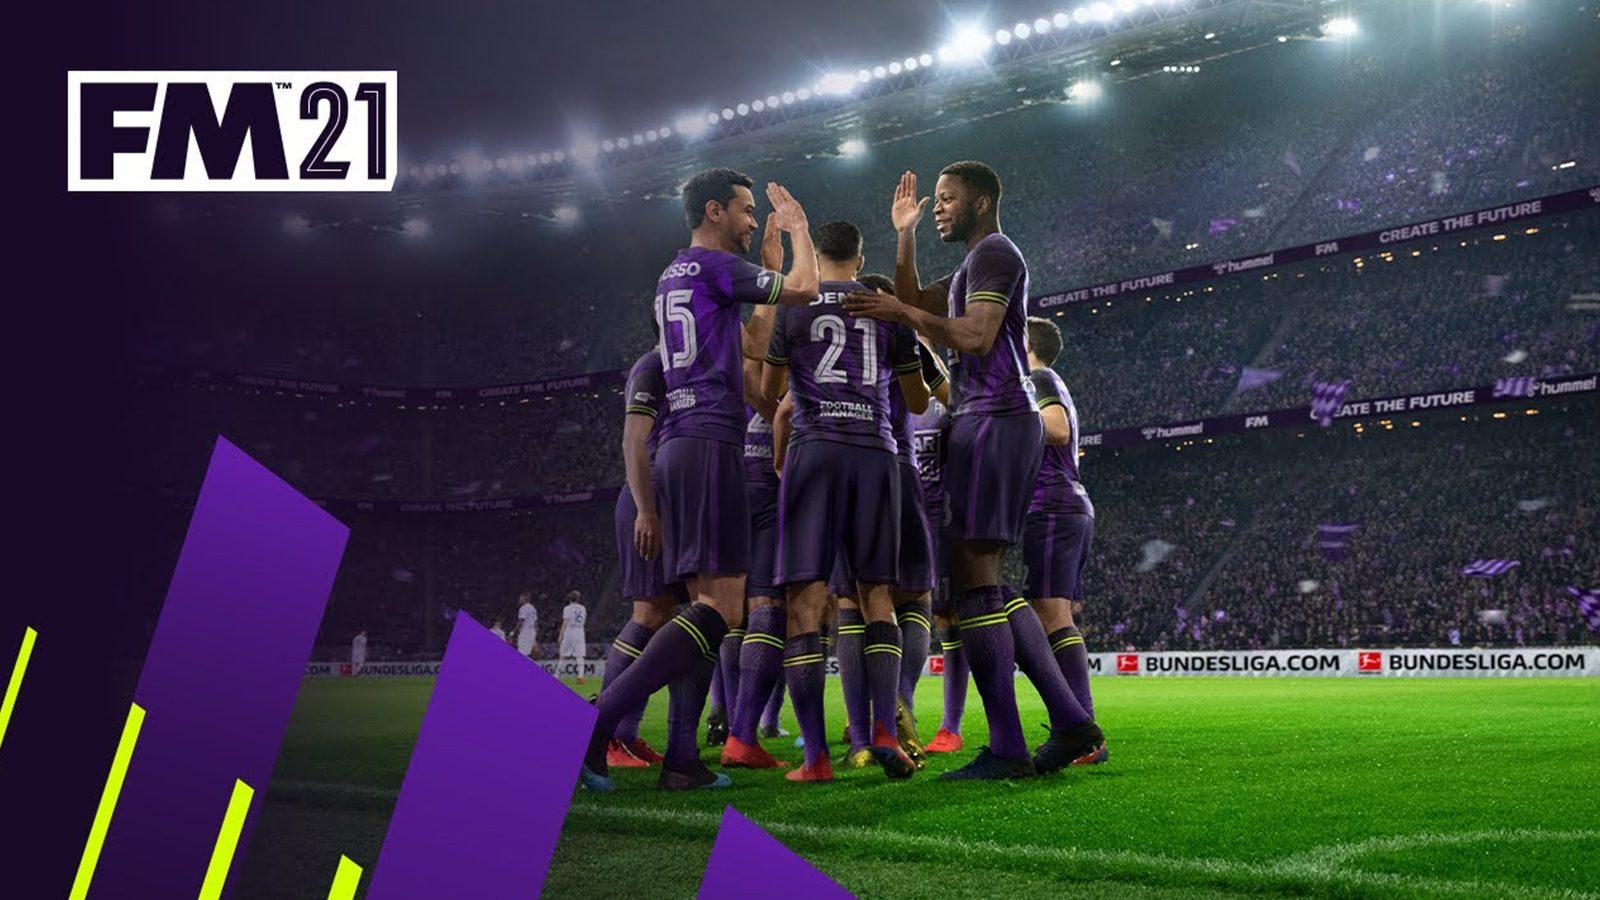 Visage des joueurs Football Manager 2021